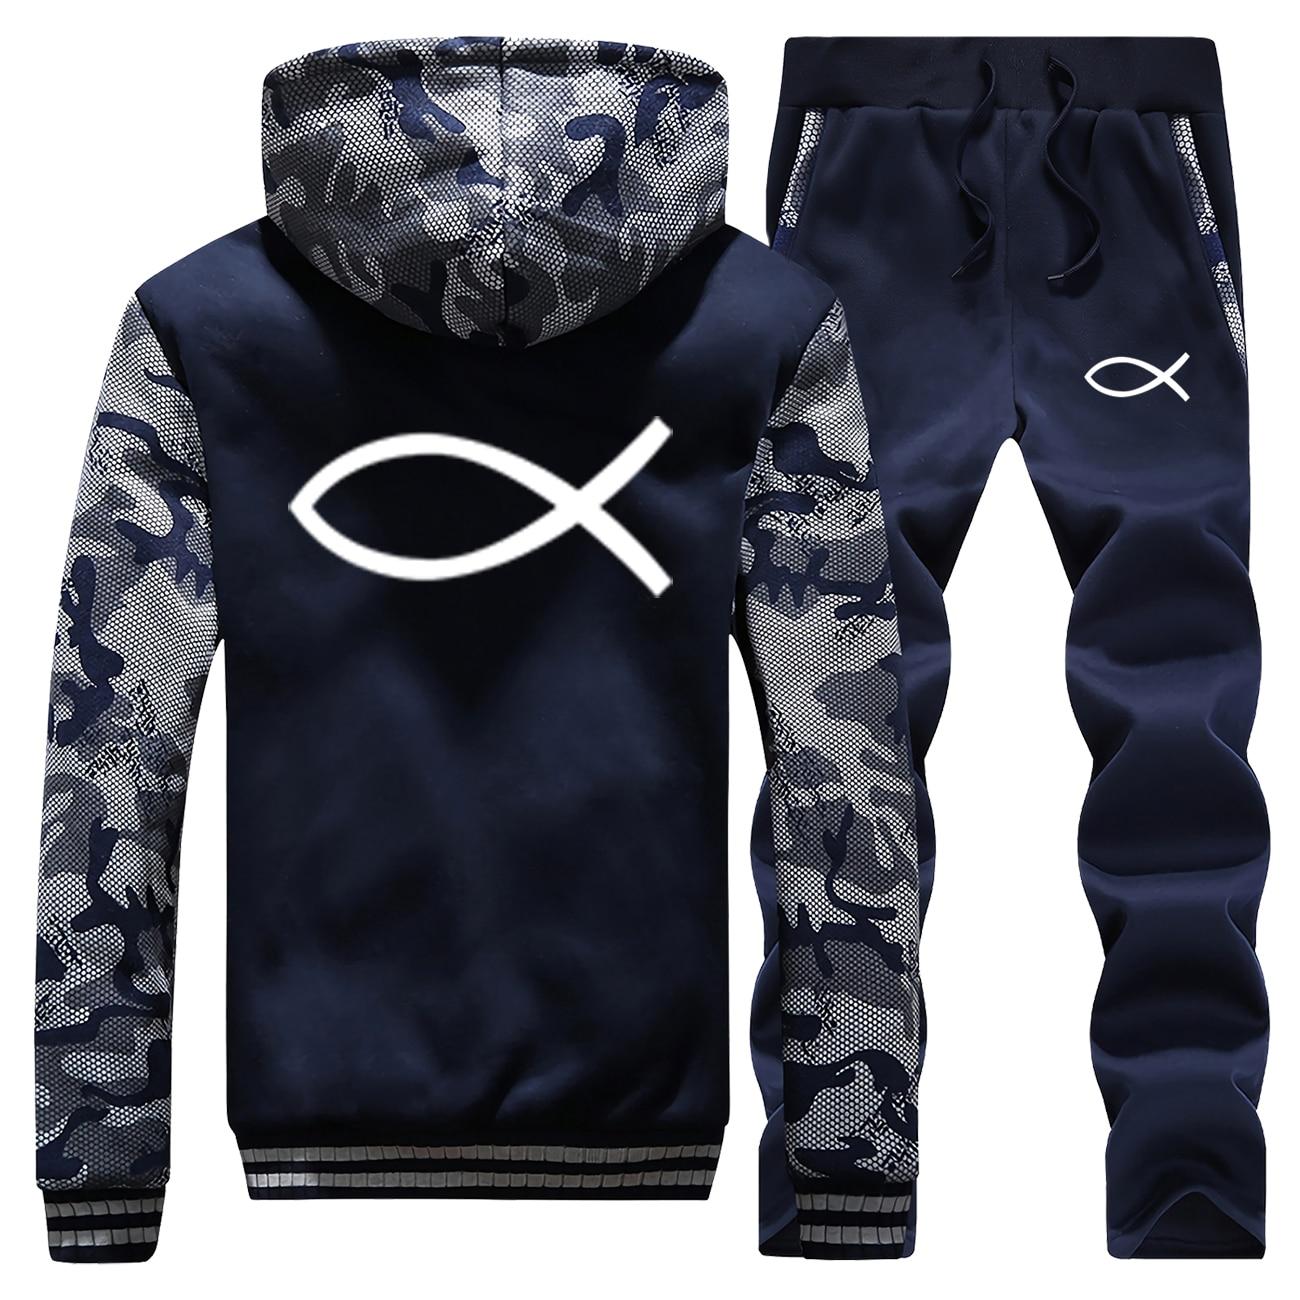 Christian JESUS fish Hoodies Thick Fleece Jacket+Pant 2 PC Sets Men Fashion Brand Sports Suit Outwear Winter Warm Mens Tracksuit